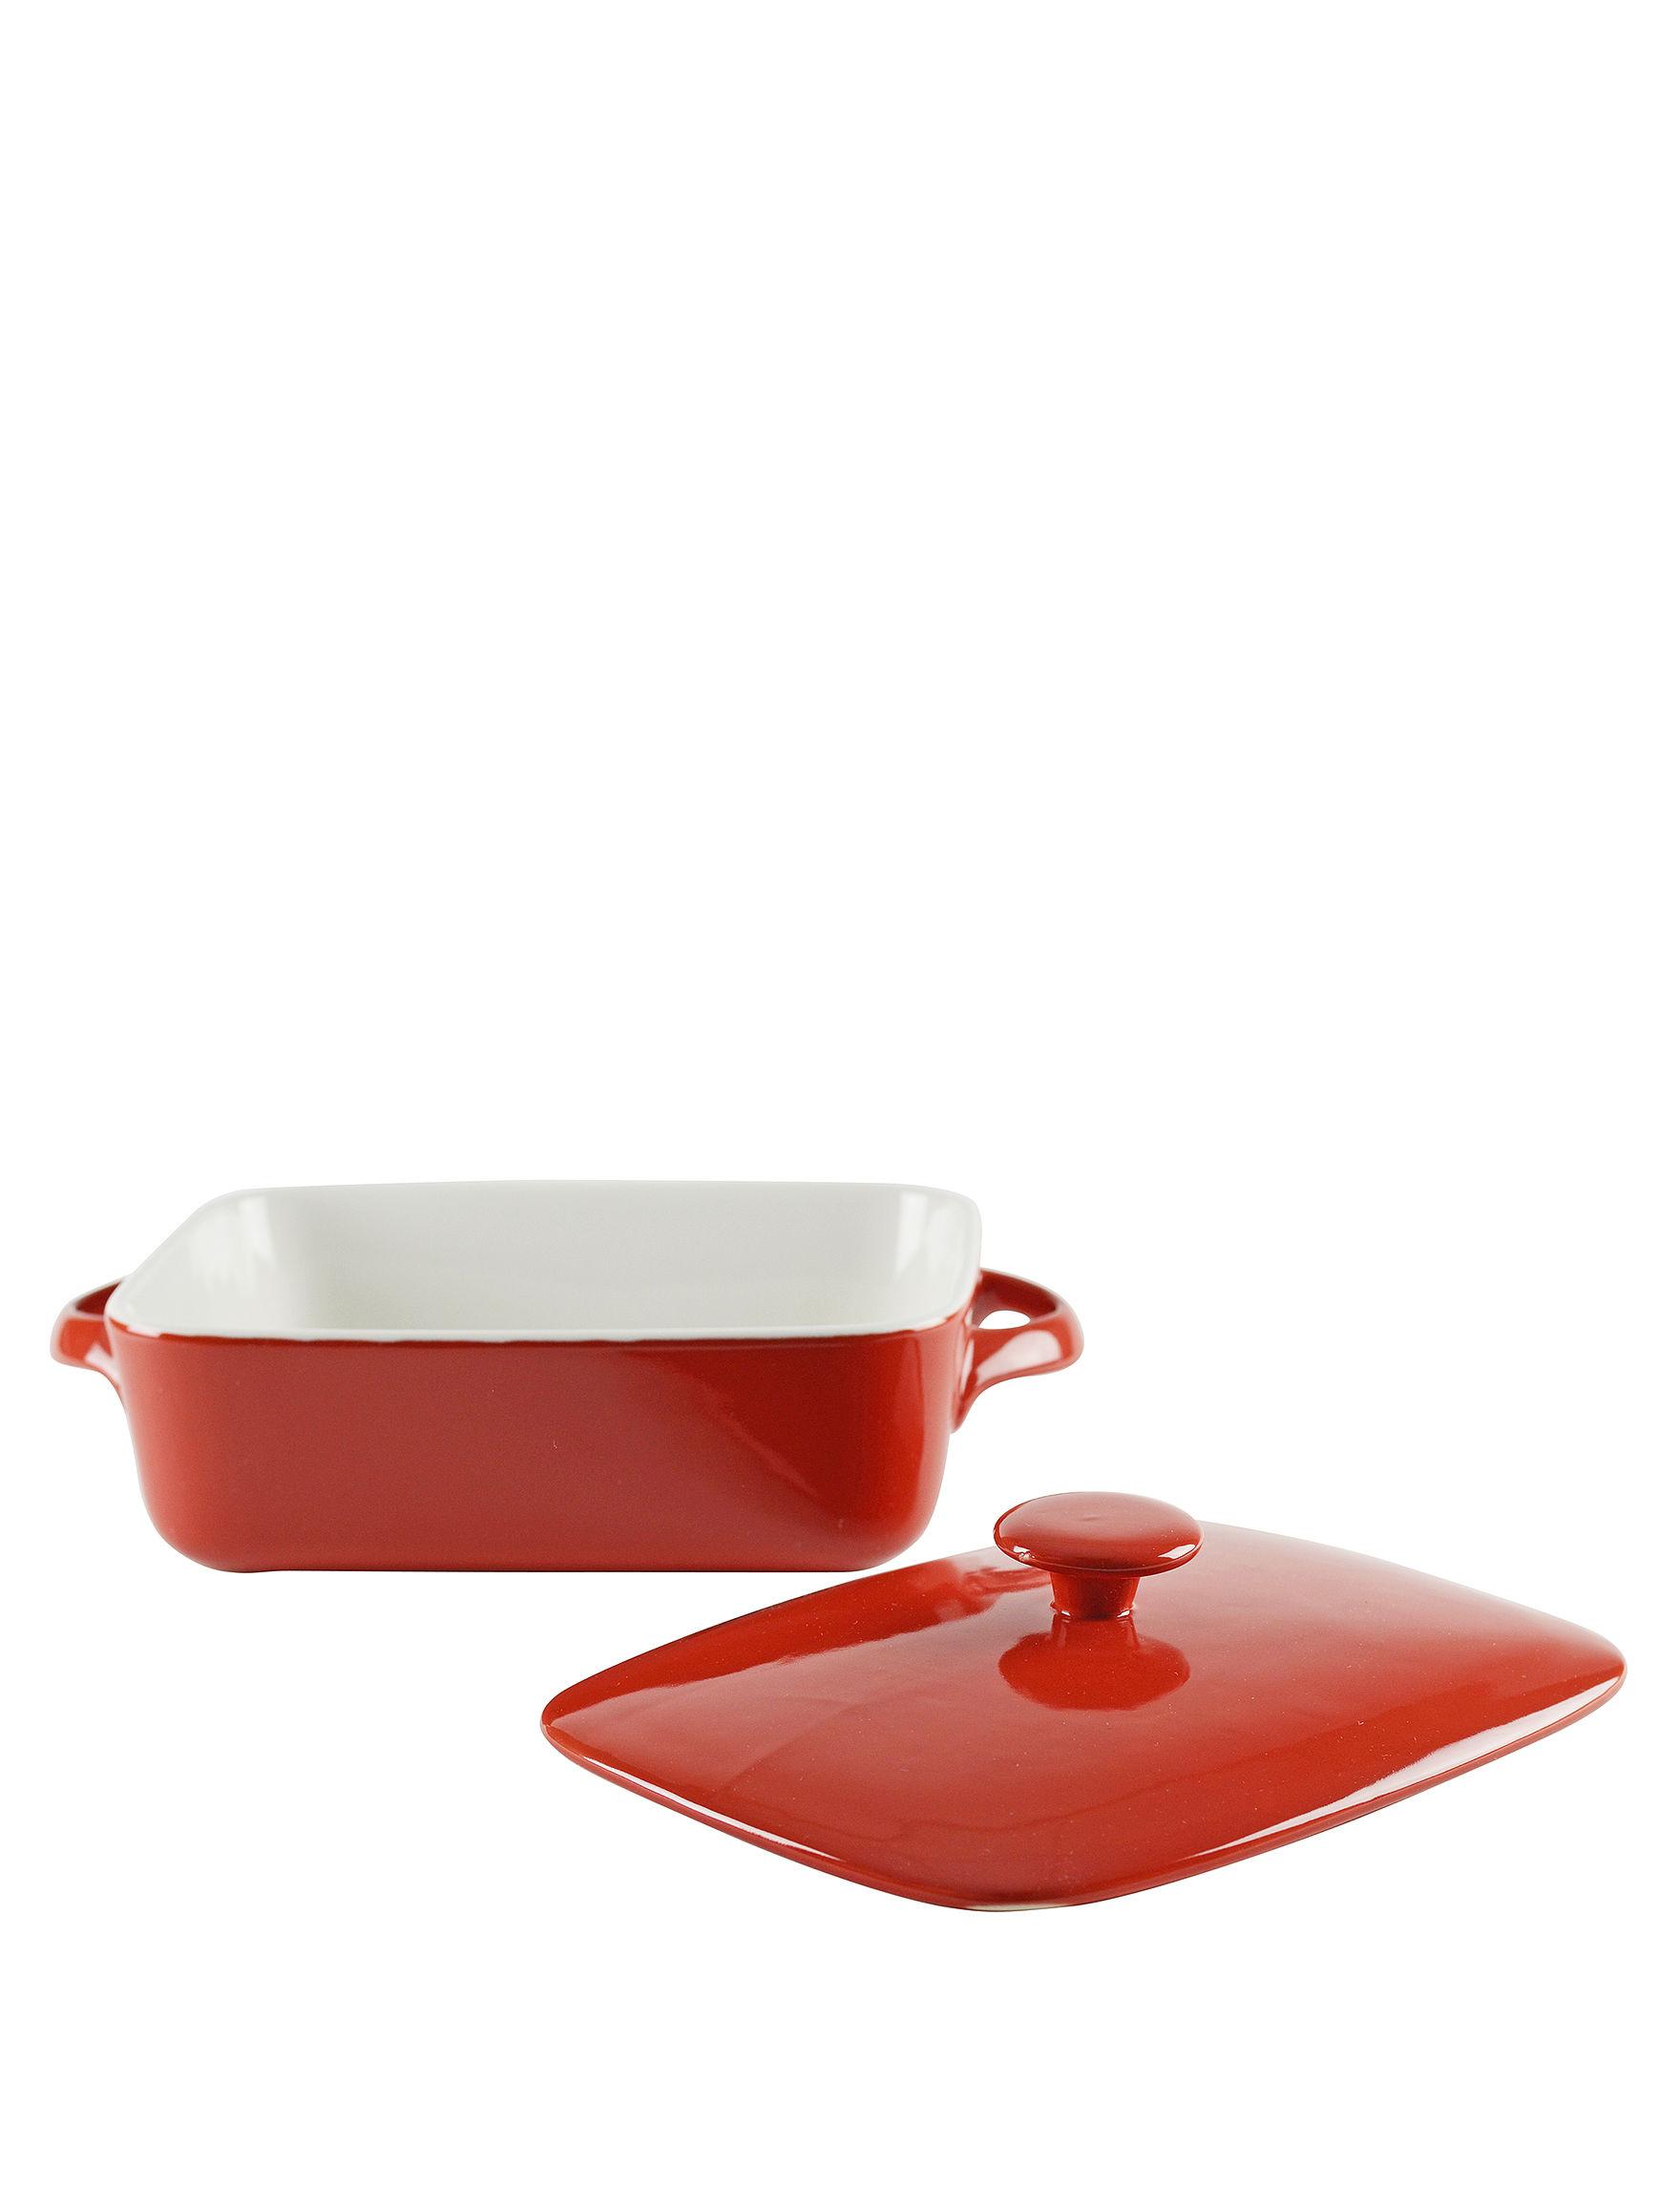 10 Strawberry Street Orange Baking & Casserole Dishes Cookware